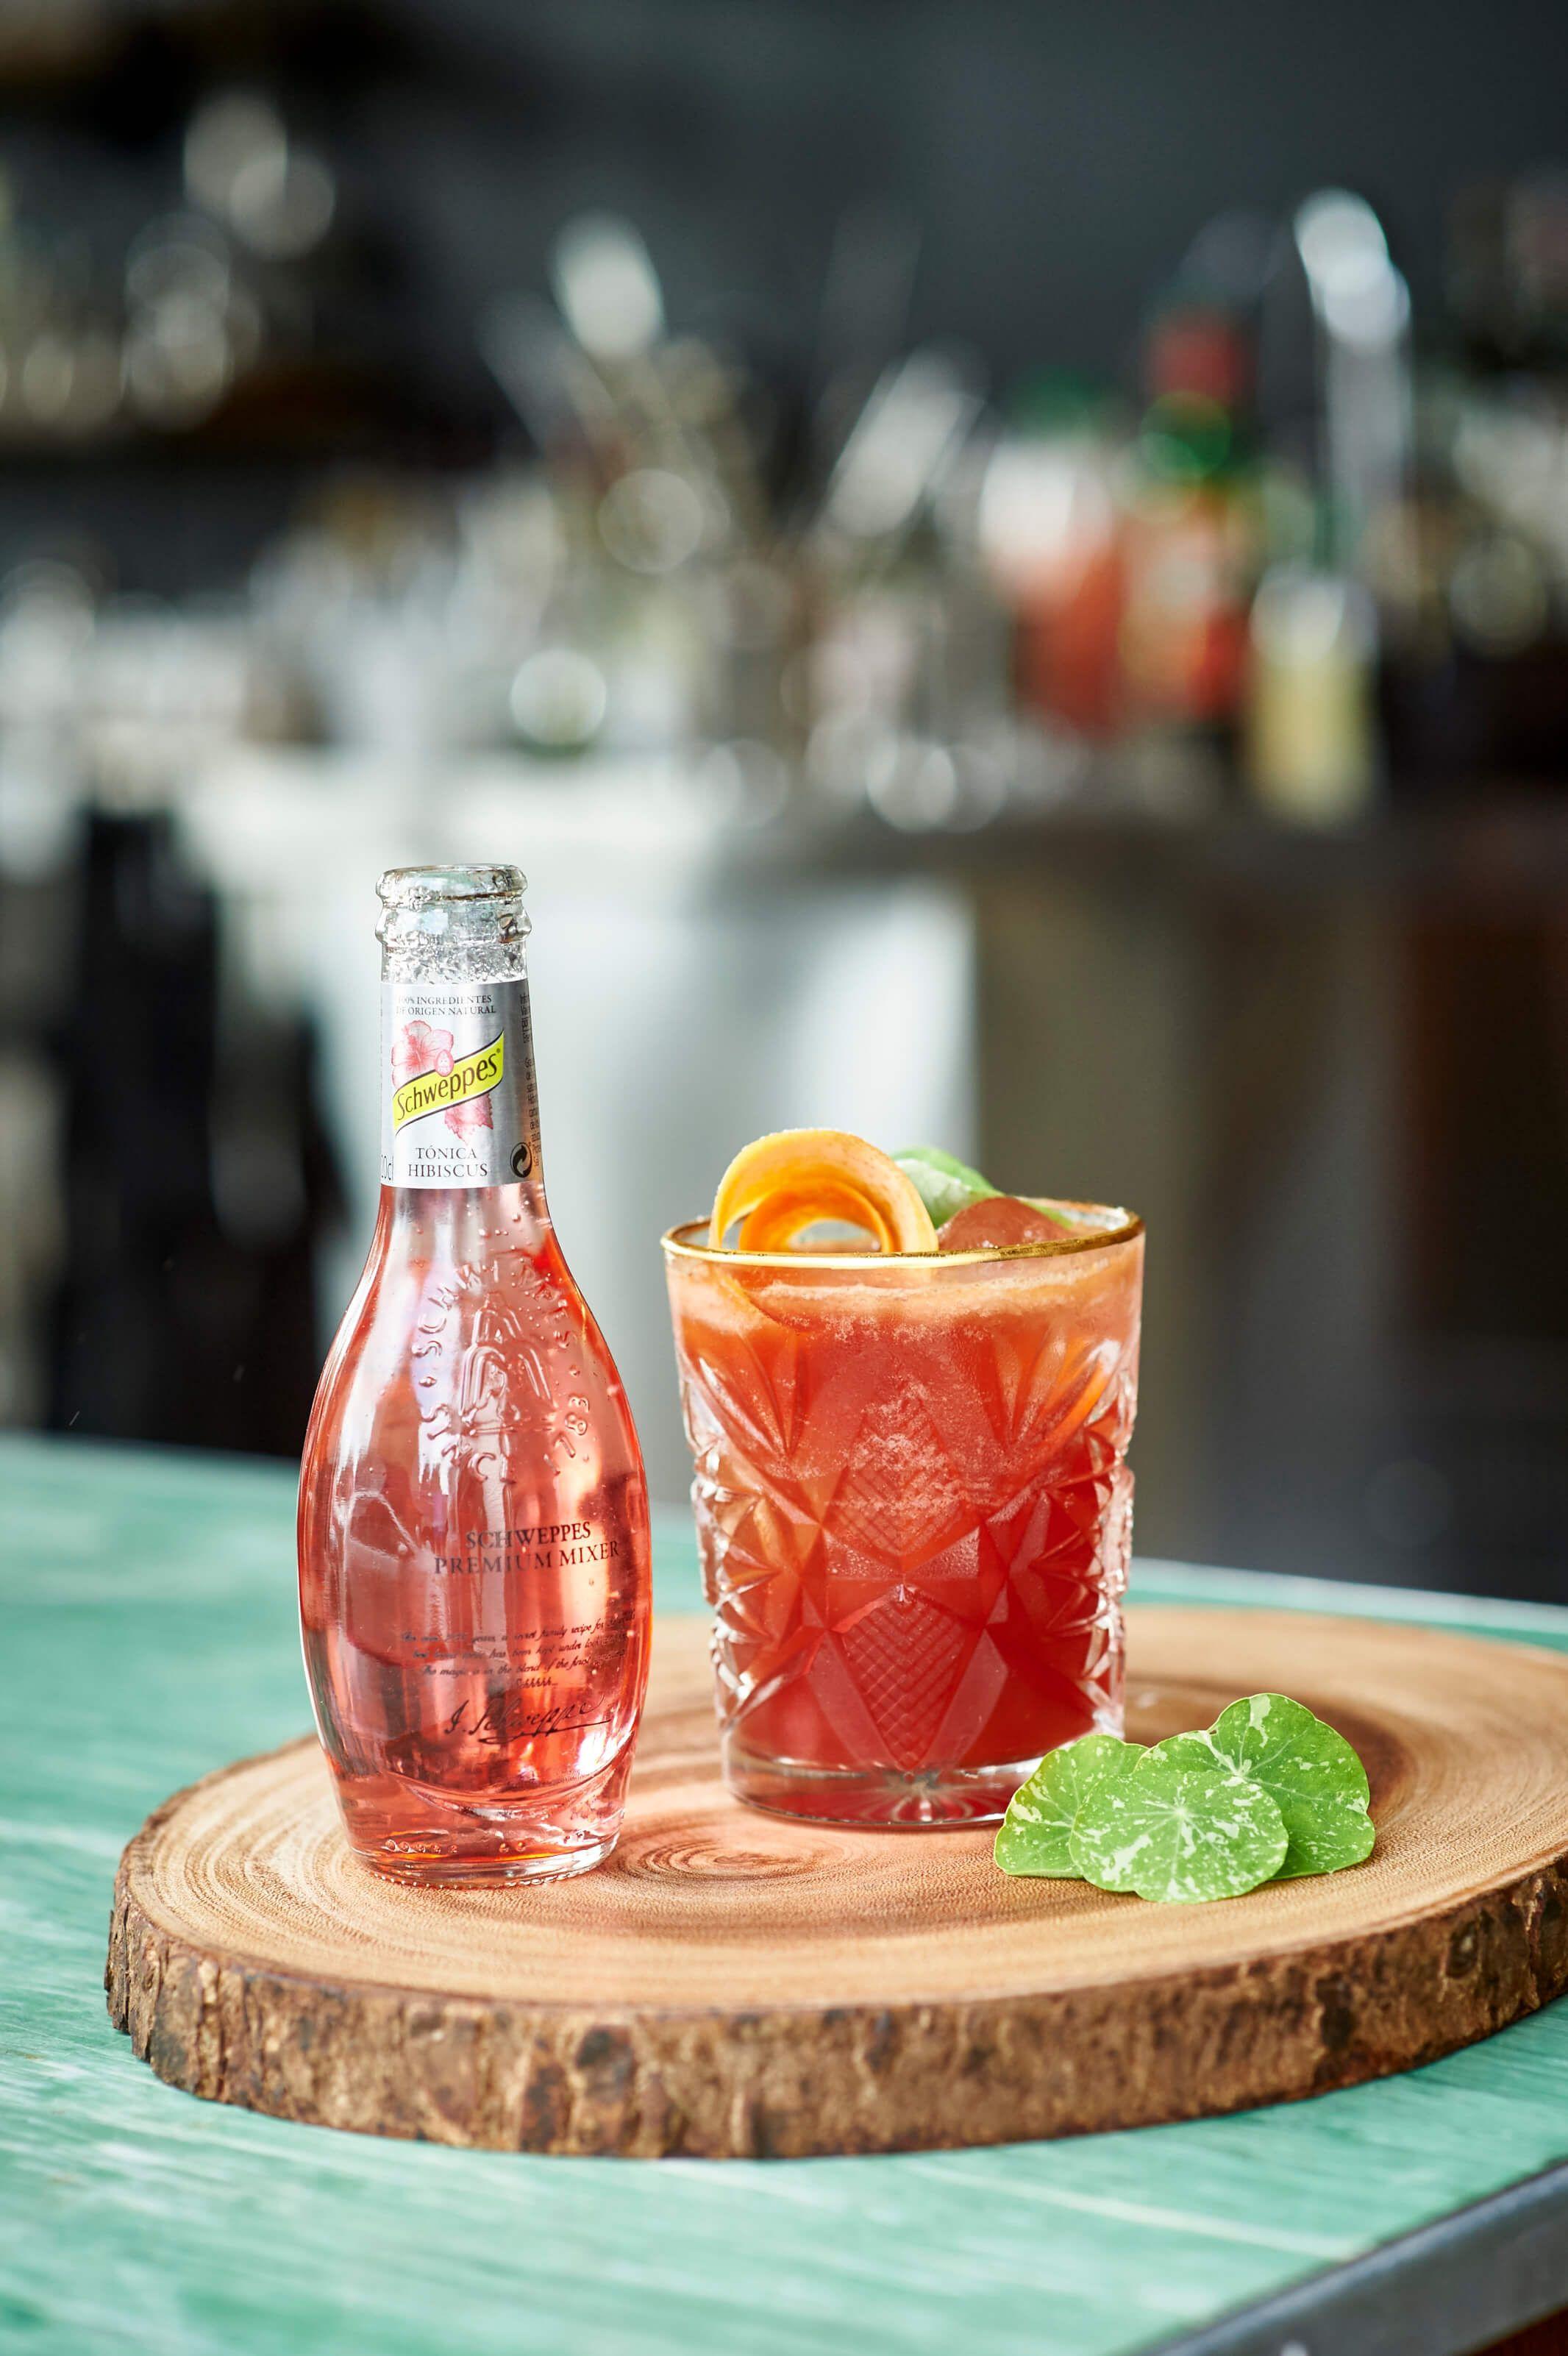 An Amazing Cocktail Mix Coeur D Artichaut Met Alcohol Gin